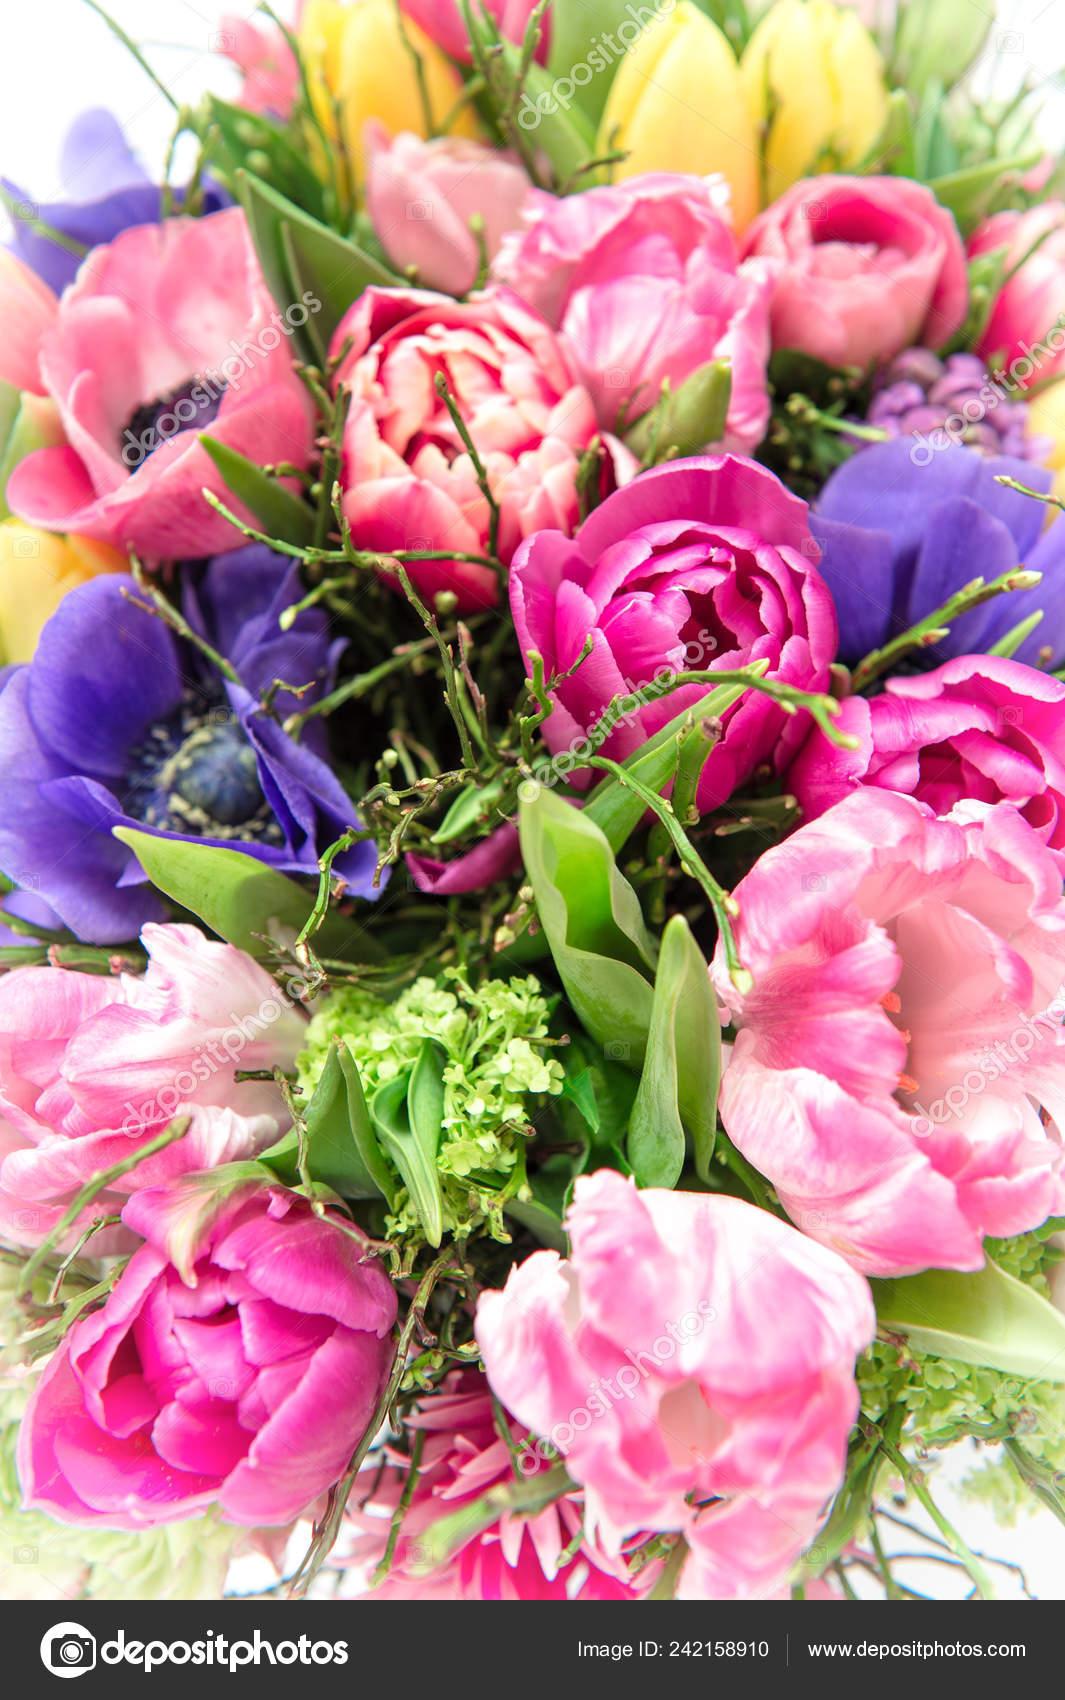 Spring Flowers Tulip Ranunculus Anemone Beautiful Bouquet Stock Photo C Liligraphie 242158910